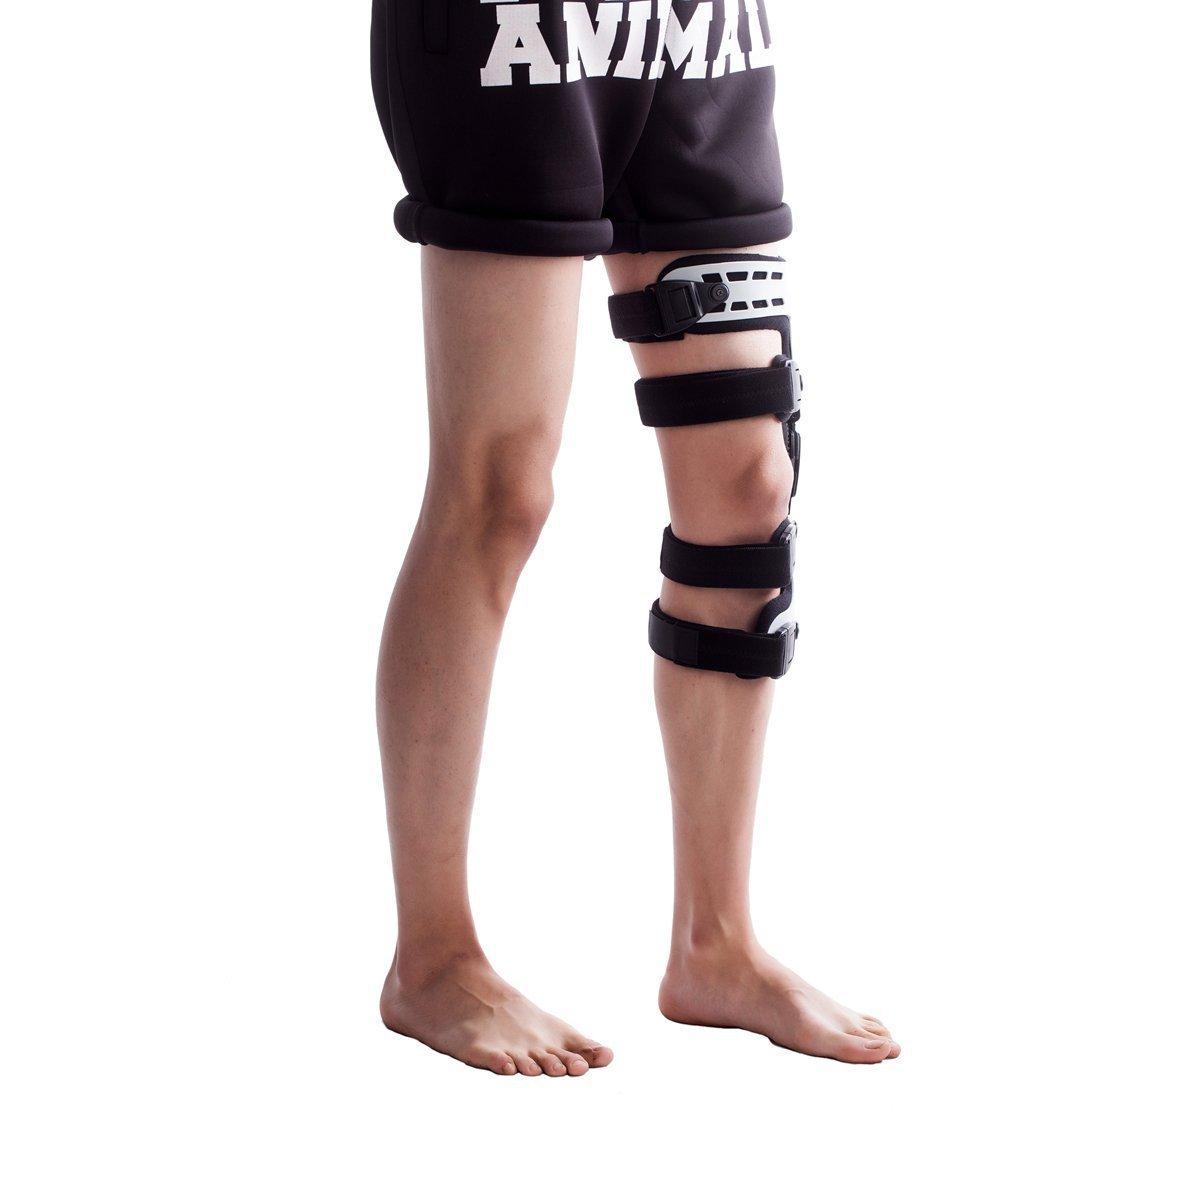 Orthomen OA Unloading Knee Brace for Osteoarthritis – Bone on Bone - Lateral Support - Size: Universal/Left by Orthomen (Image #4)